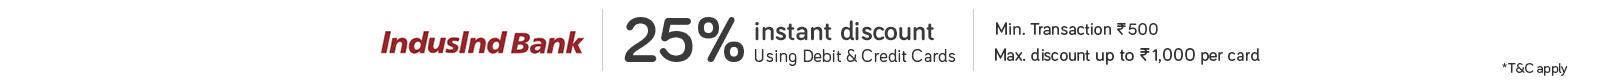 Snapdeal IndusInd Bank Debit Credit Card Offer